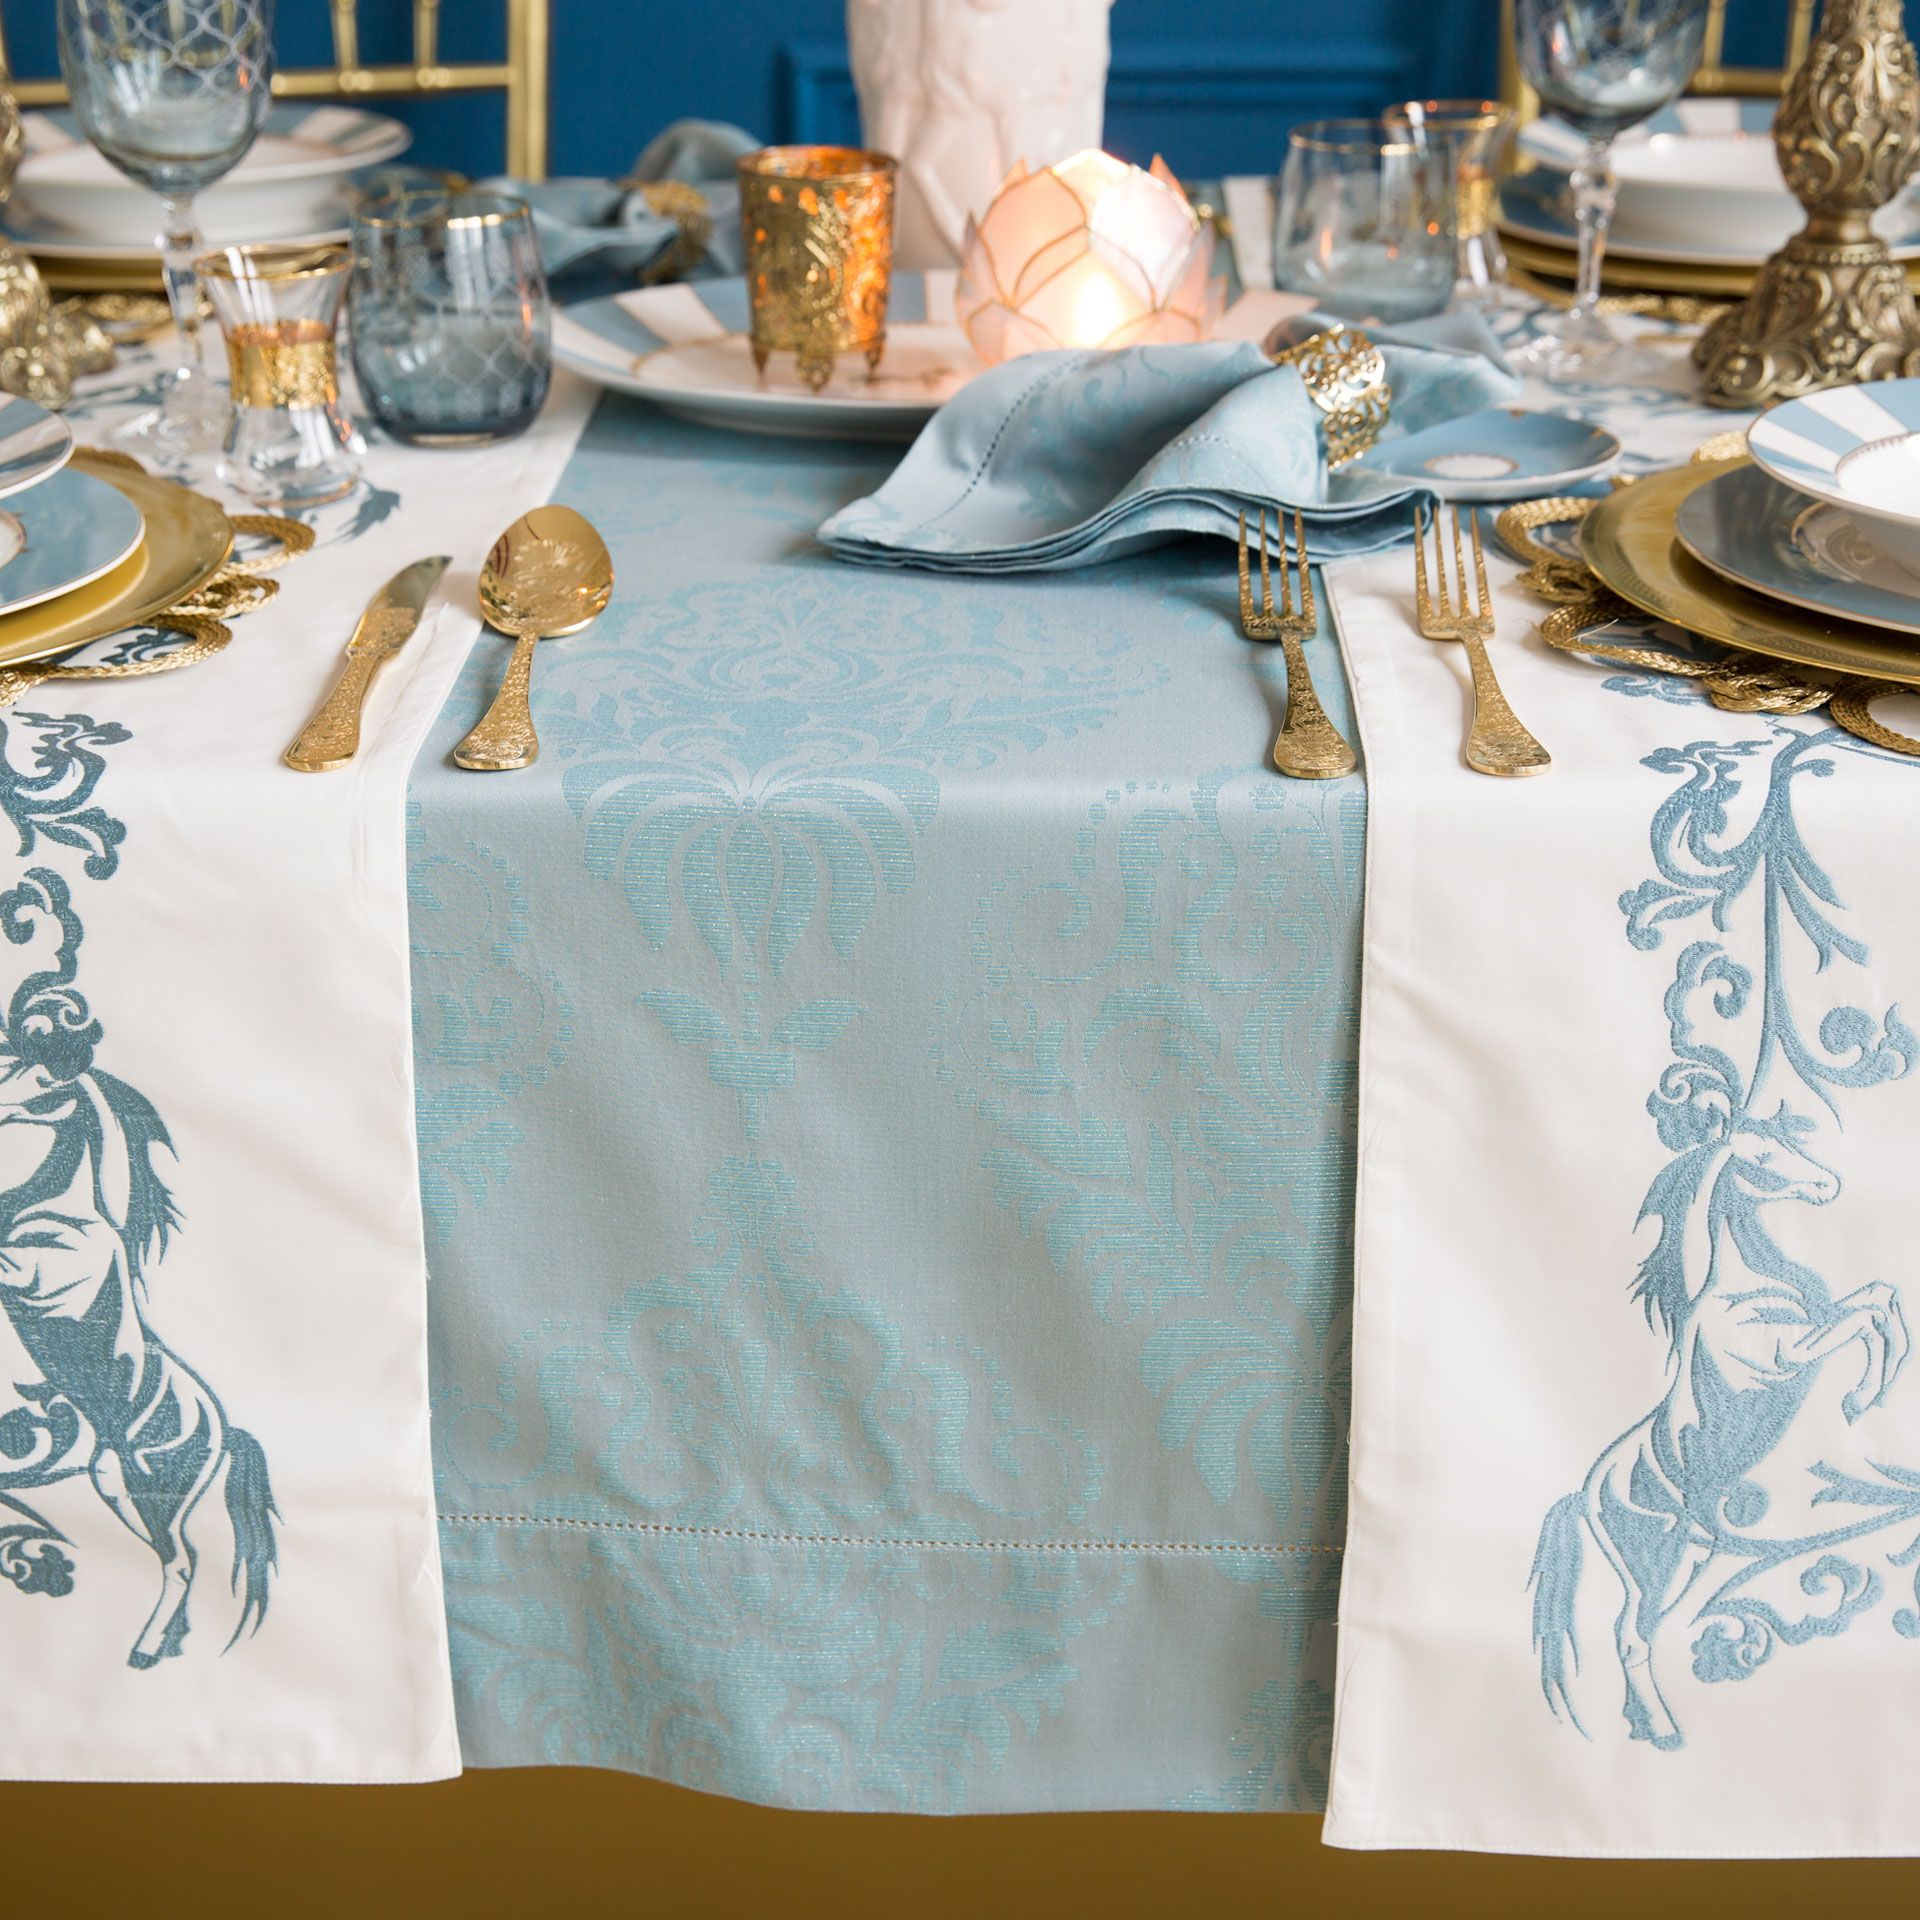 Mantel y servilleta algod n jacquard azul oscuro for Servilletas papel zara home